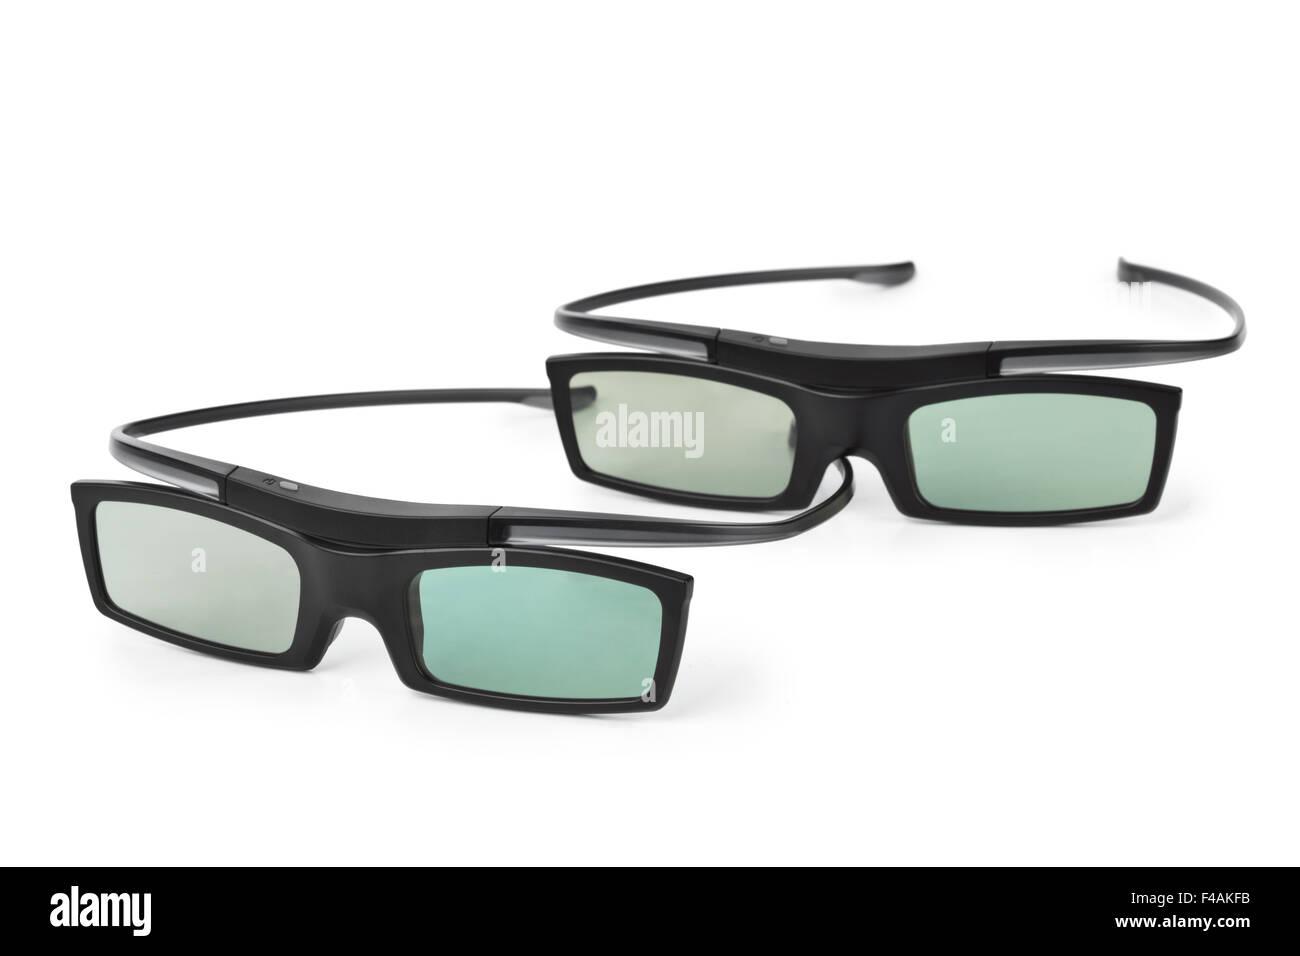 3d glasses - Stock Image